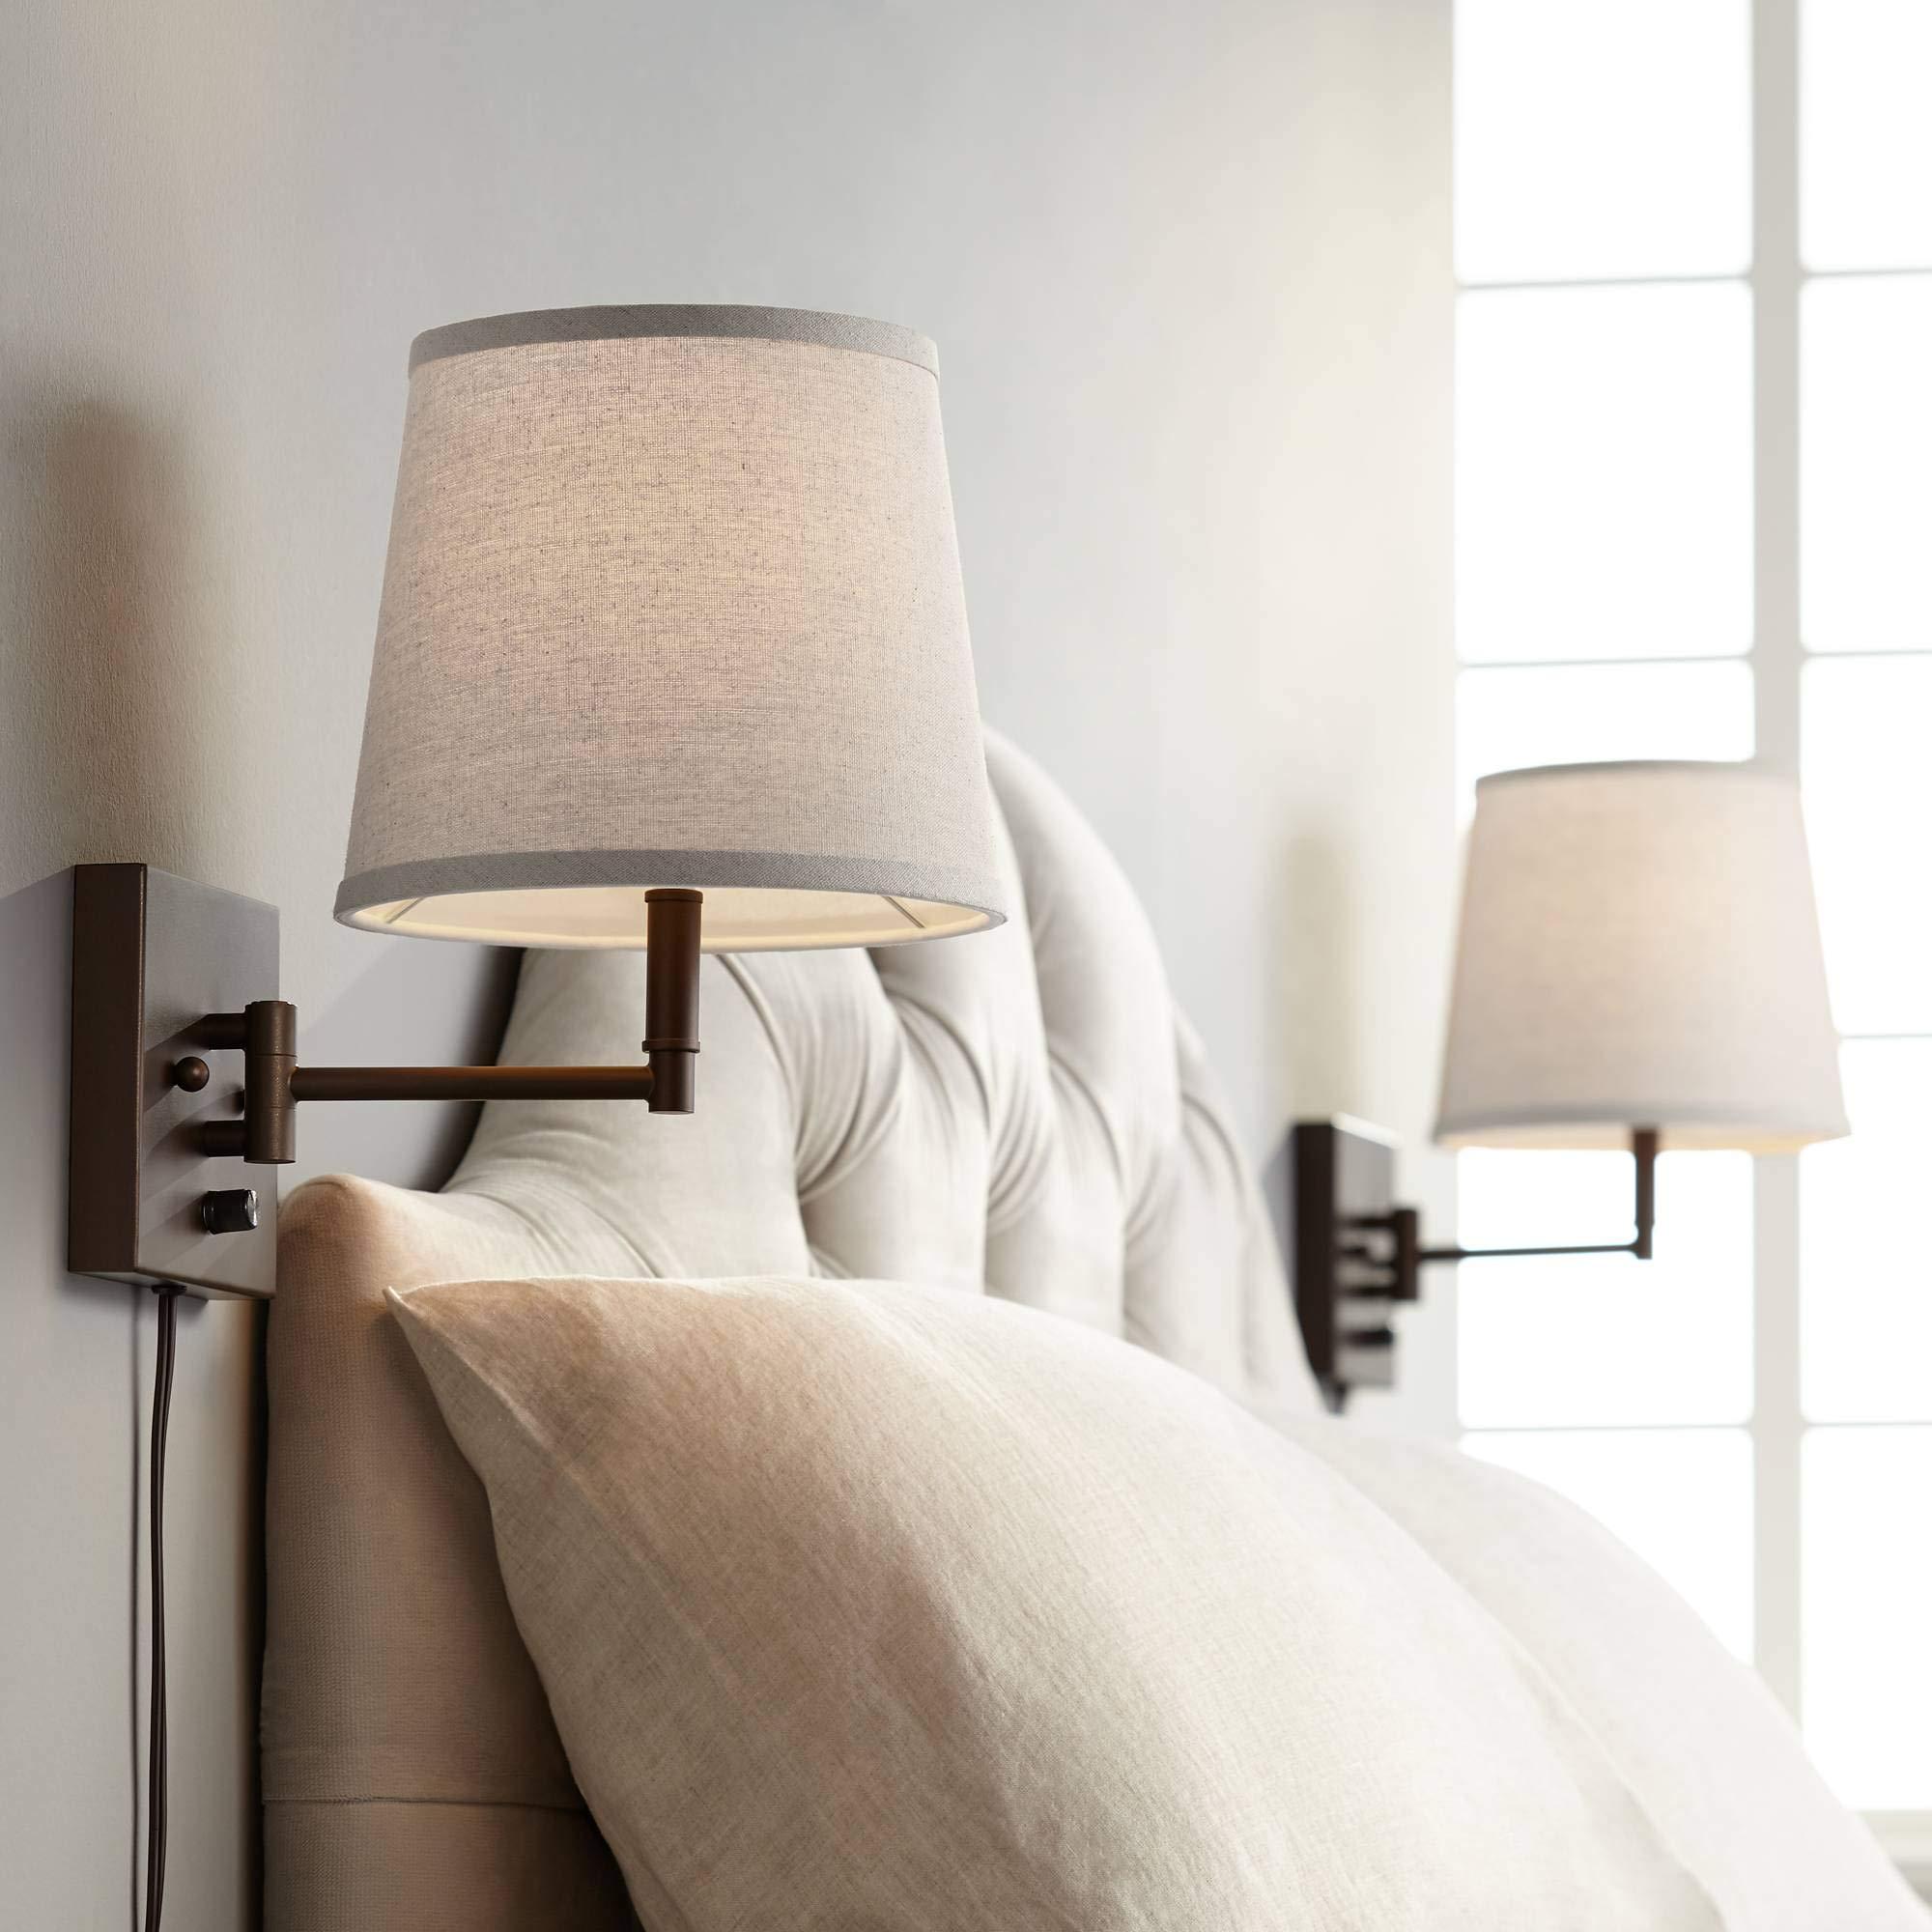 Lanett Painted Bronze Plug-in Swing Arm Wall Lamp Set of 2-360 Lighting